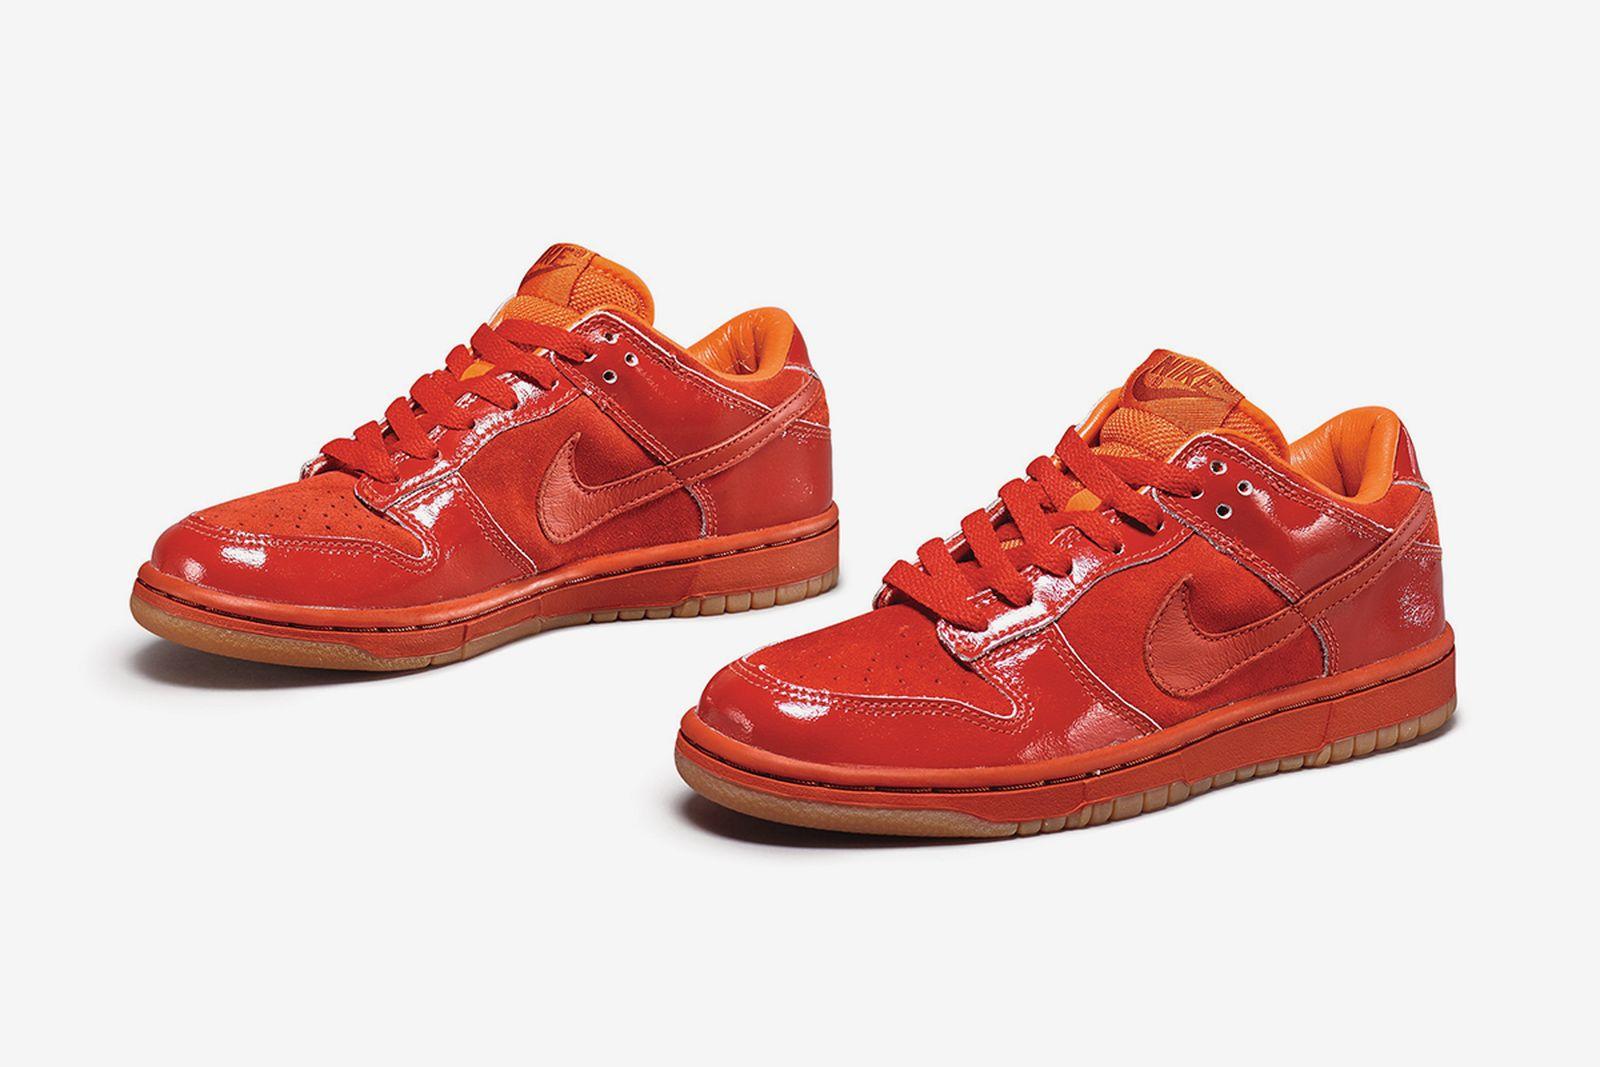 sothebys-nike-sneaker-auction-05